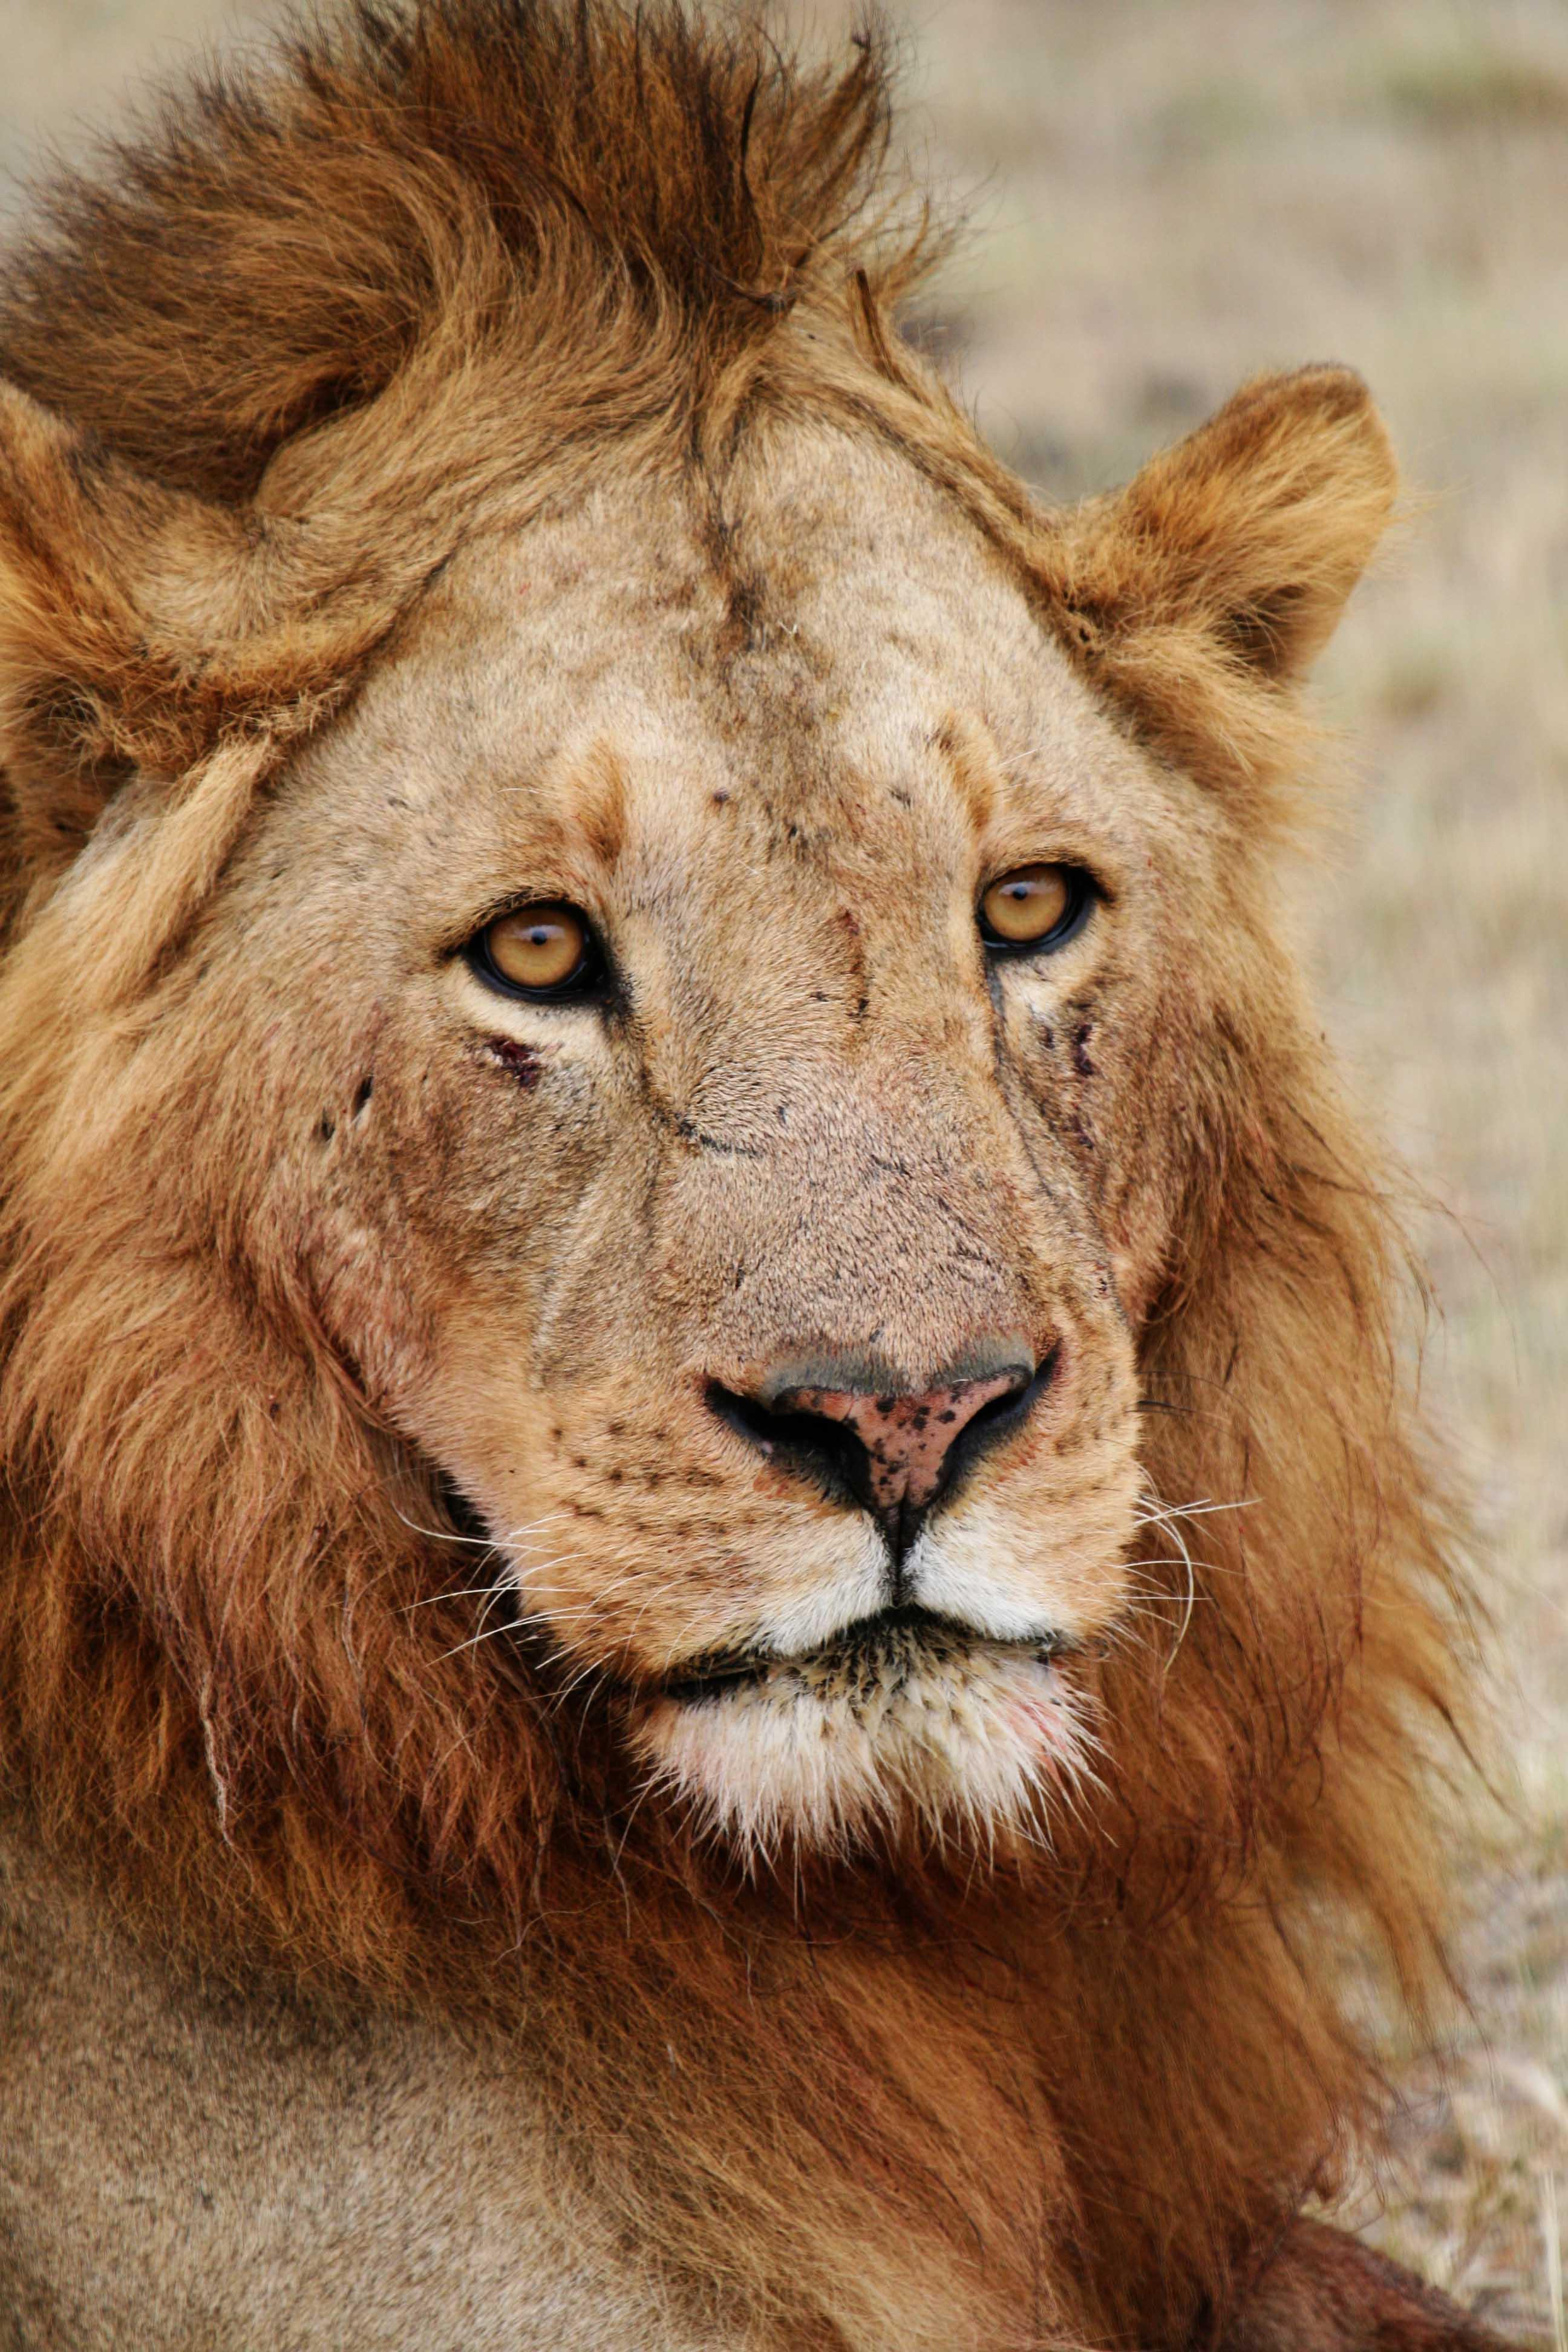 File:Male lion face.jpg